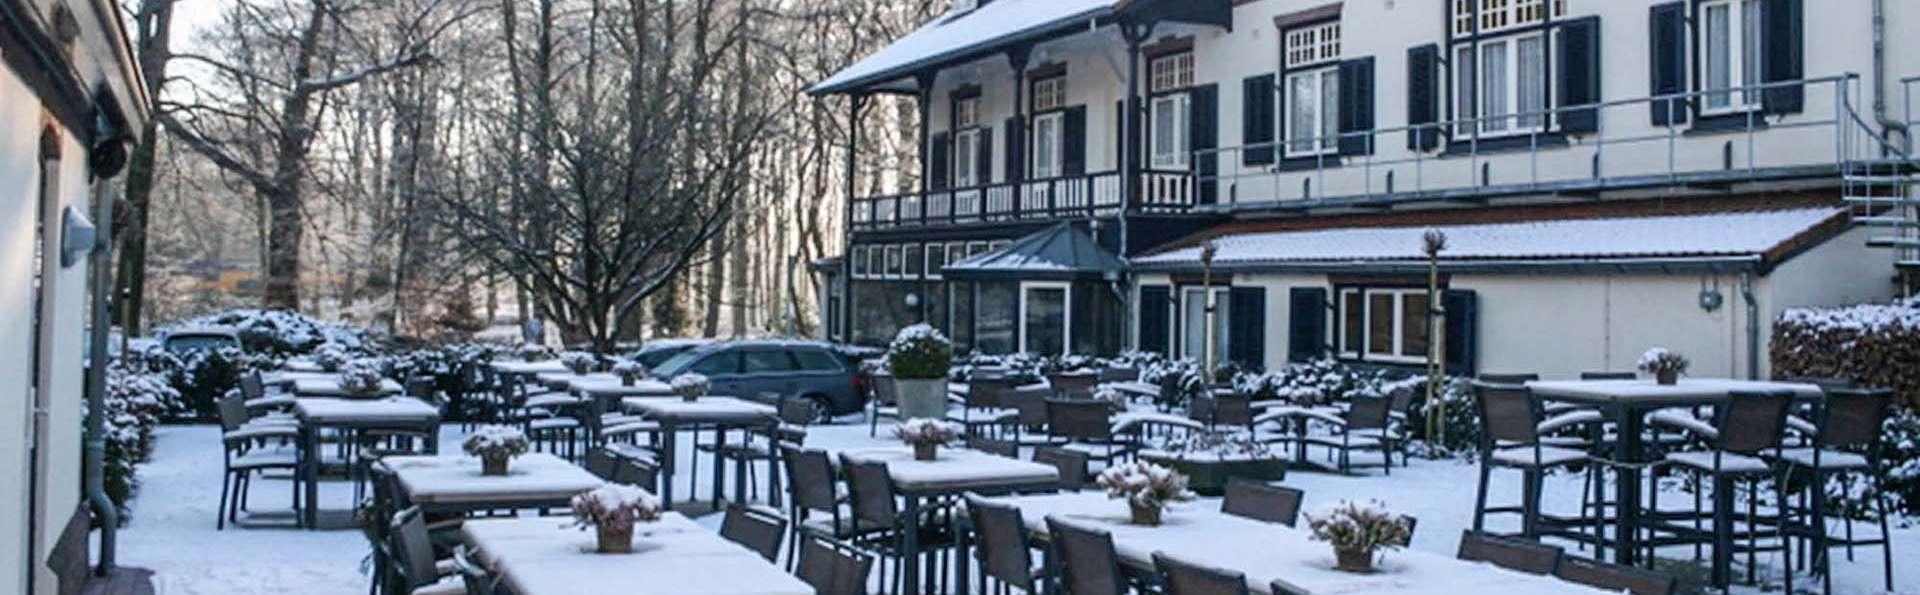 Pillows Charme Hotel Château de Raay Limburg  - EDIT_sandton_rhe_property_terrace_01.jpg